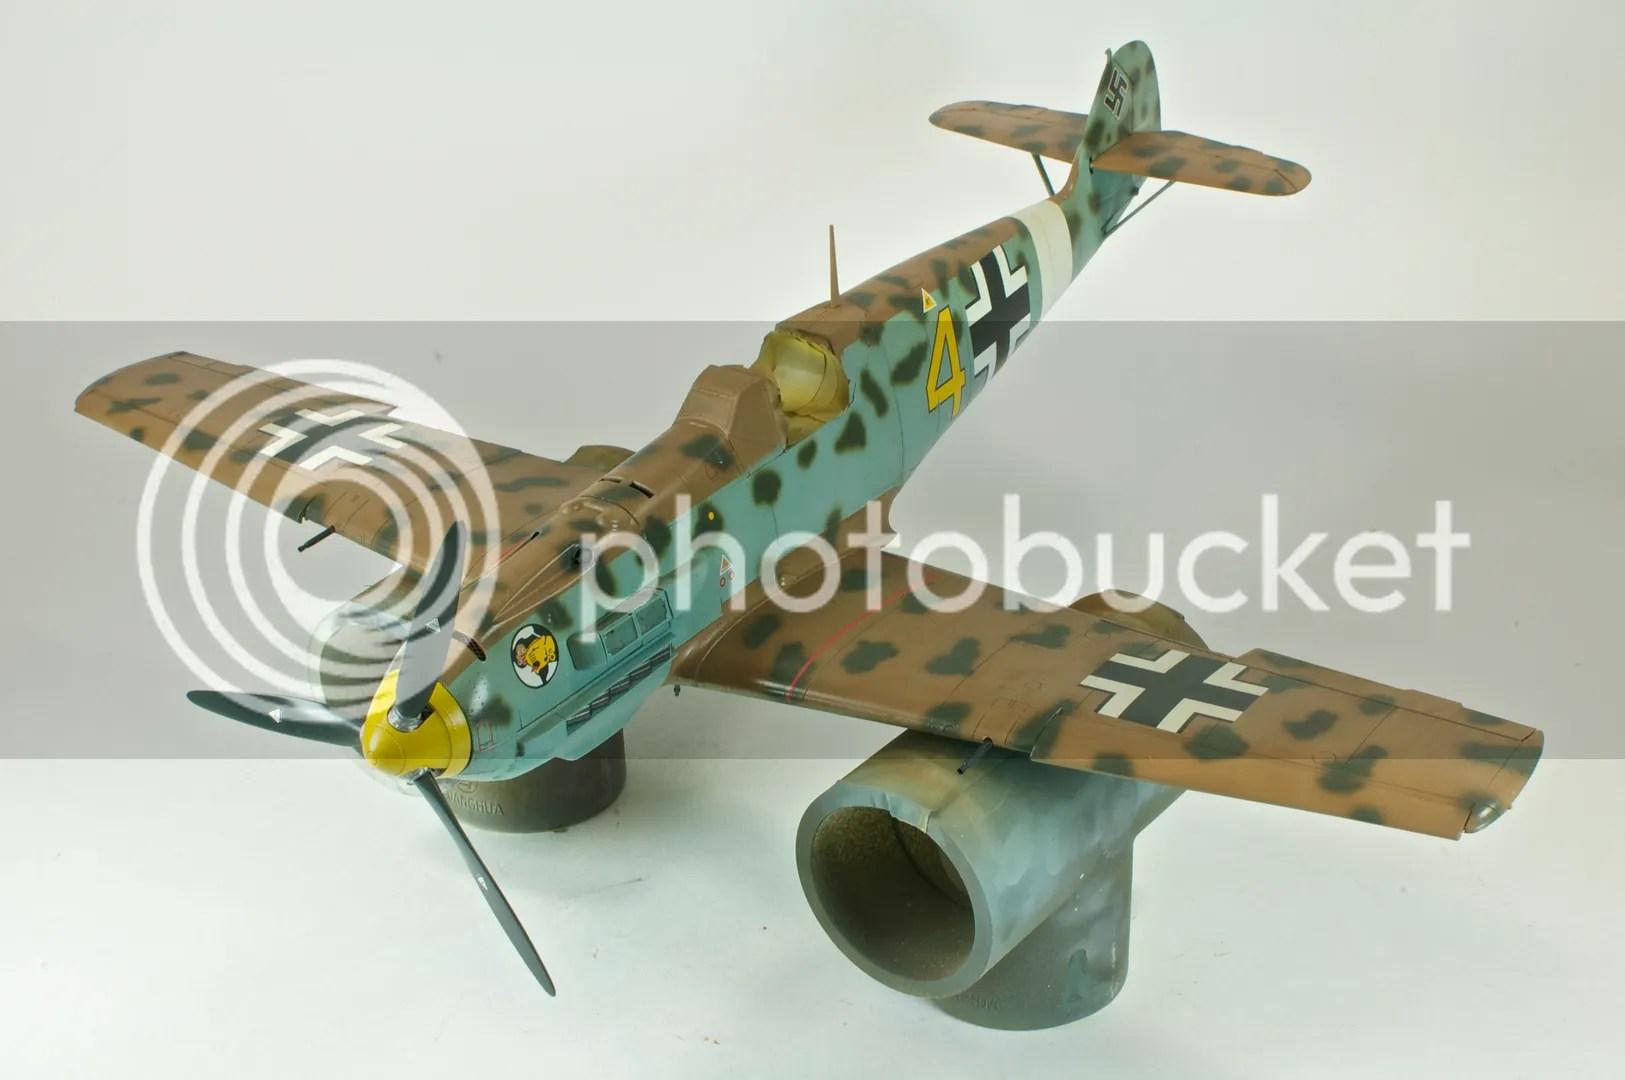 2011,1/32,Bf 109E-7 Trop,Eduard,February,Nikon D300s,scale models